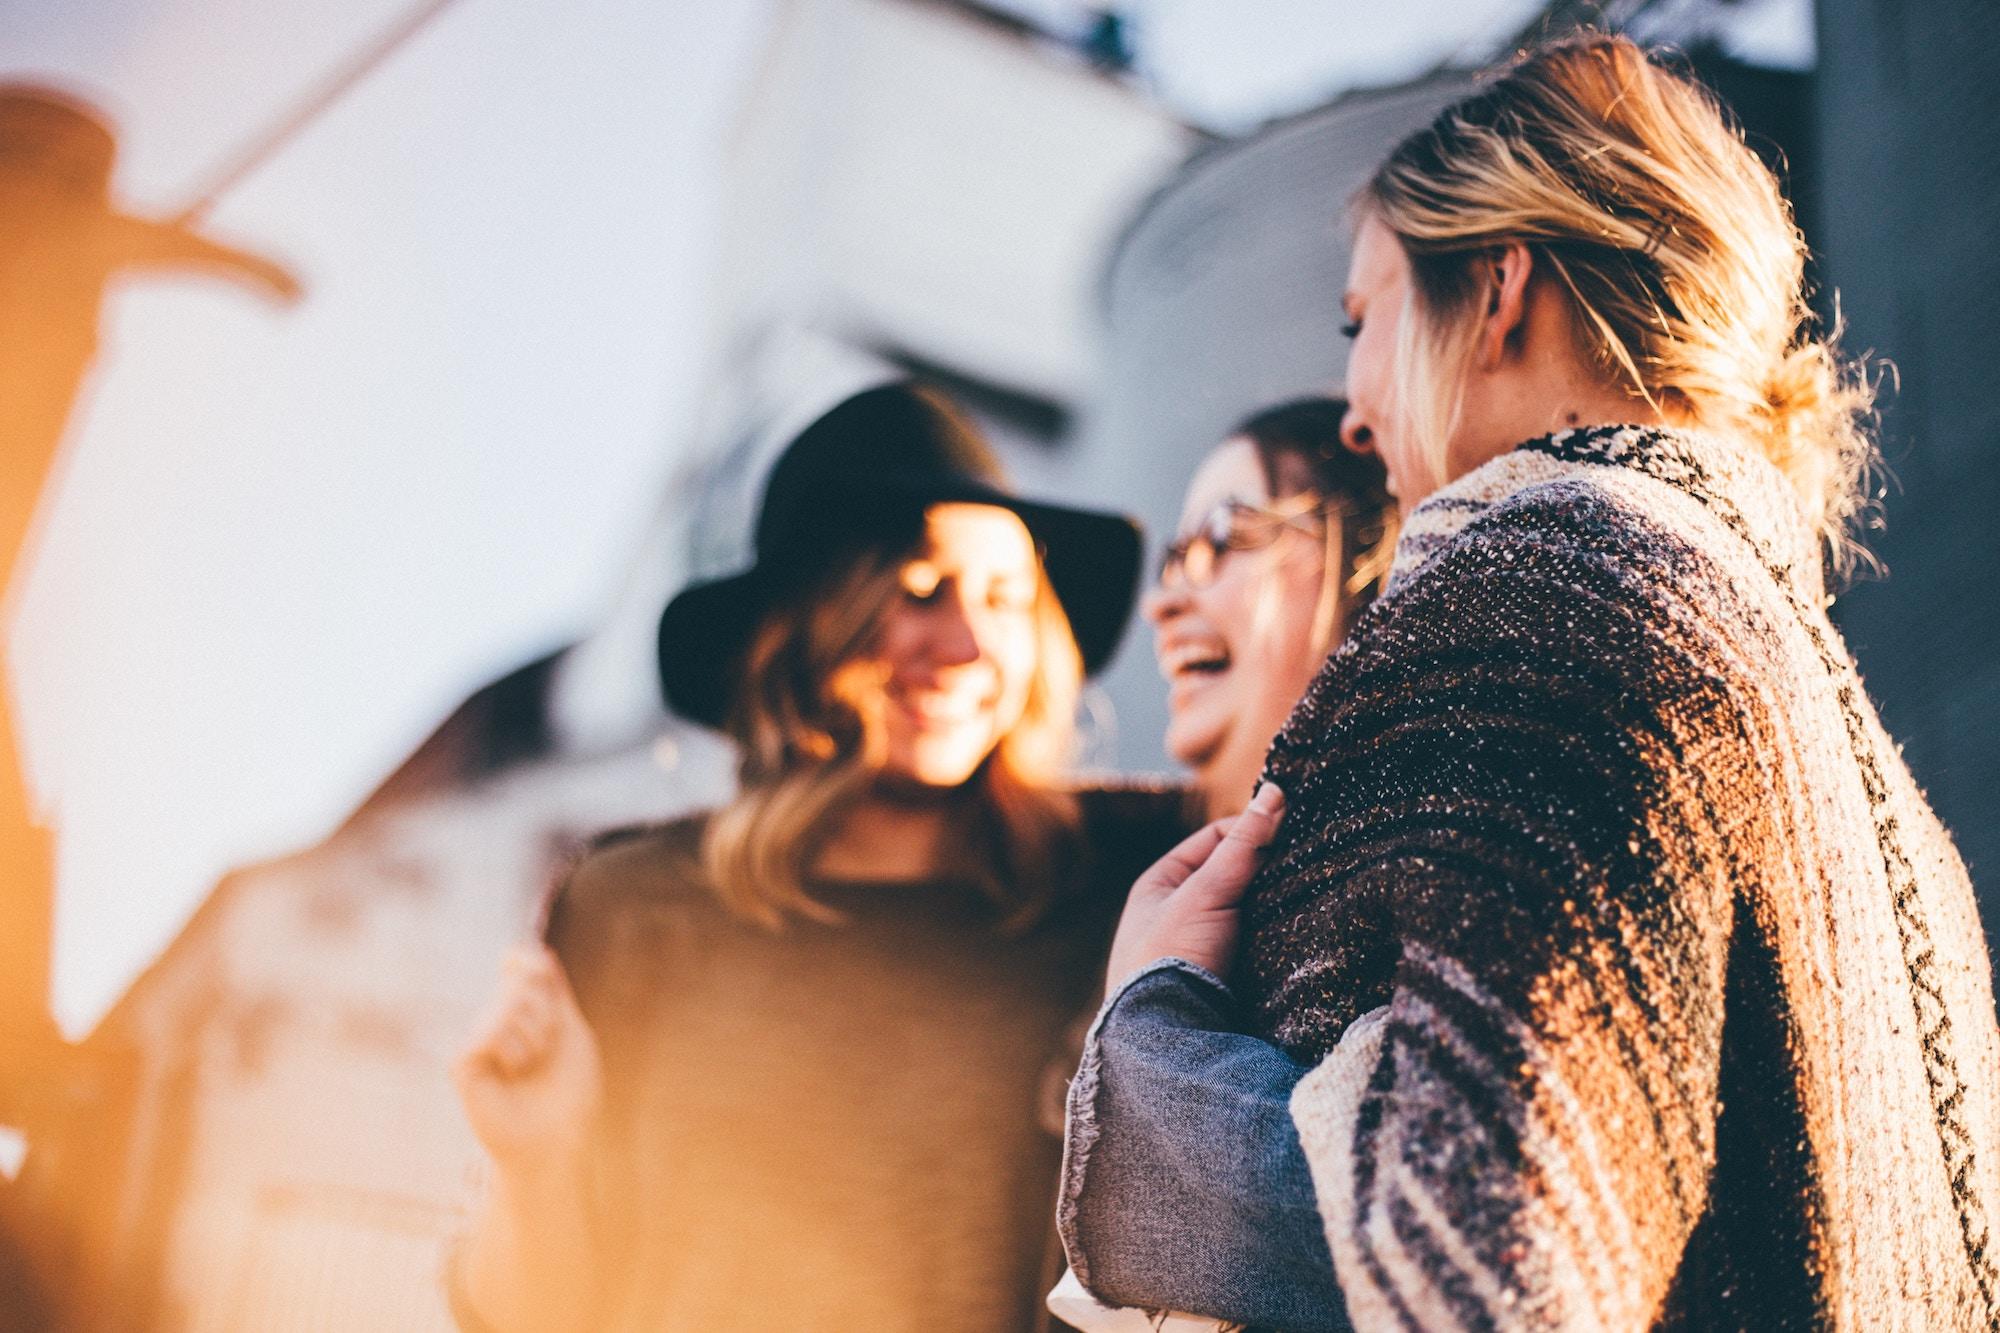 5 Stories of Women Helping Women